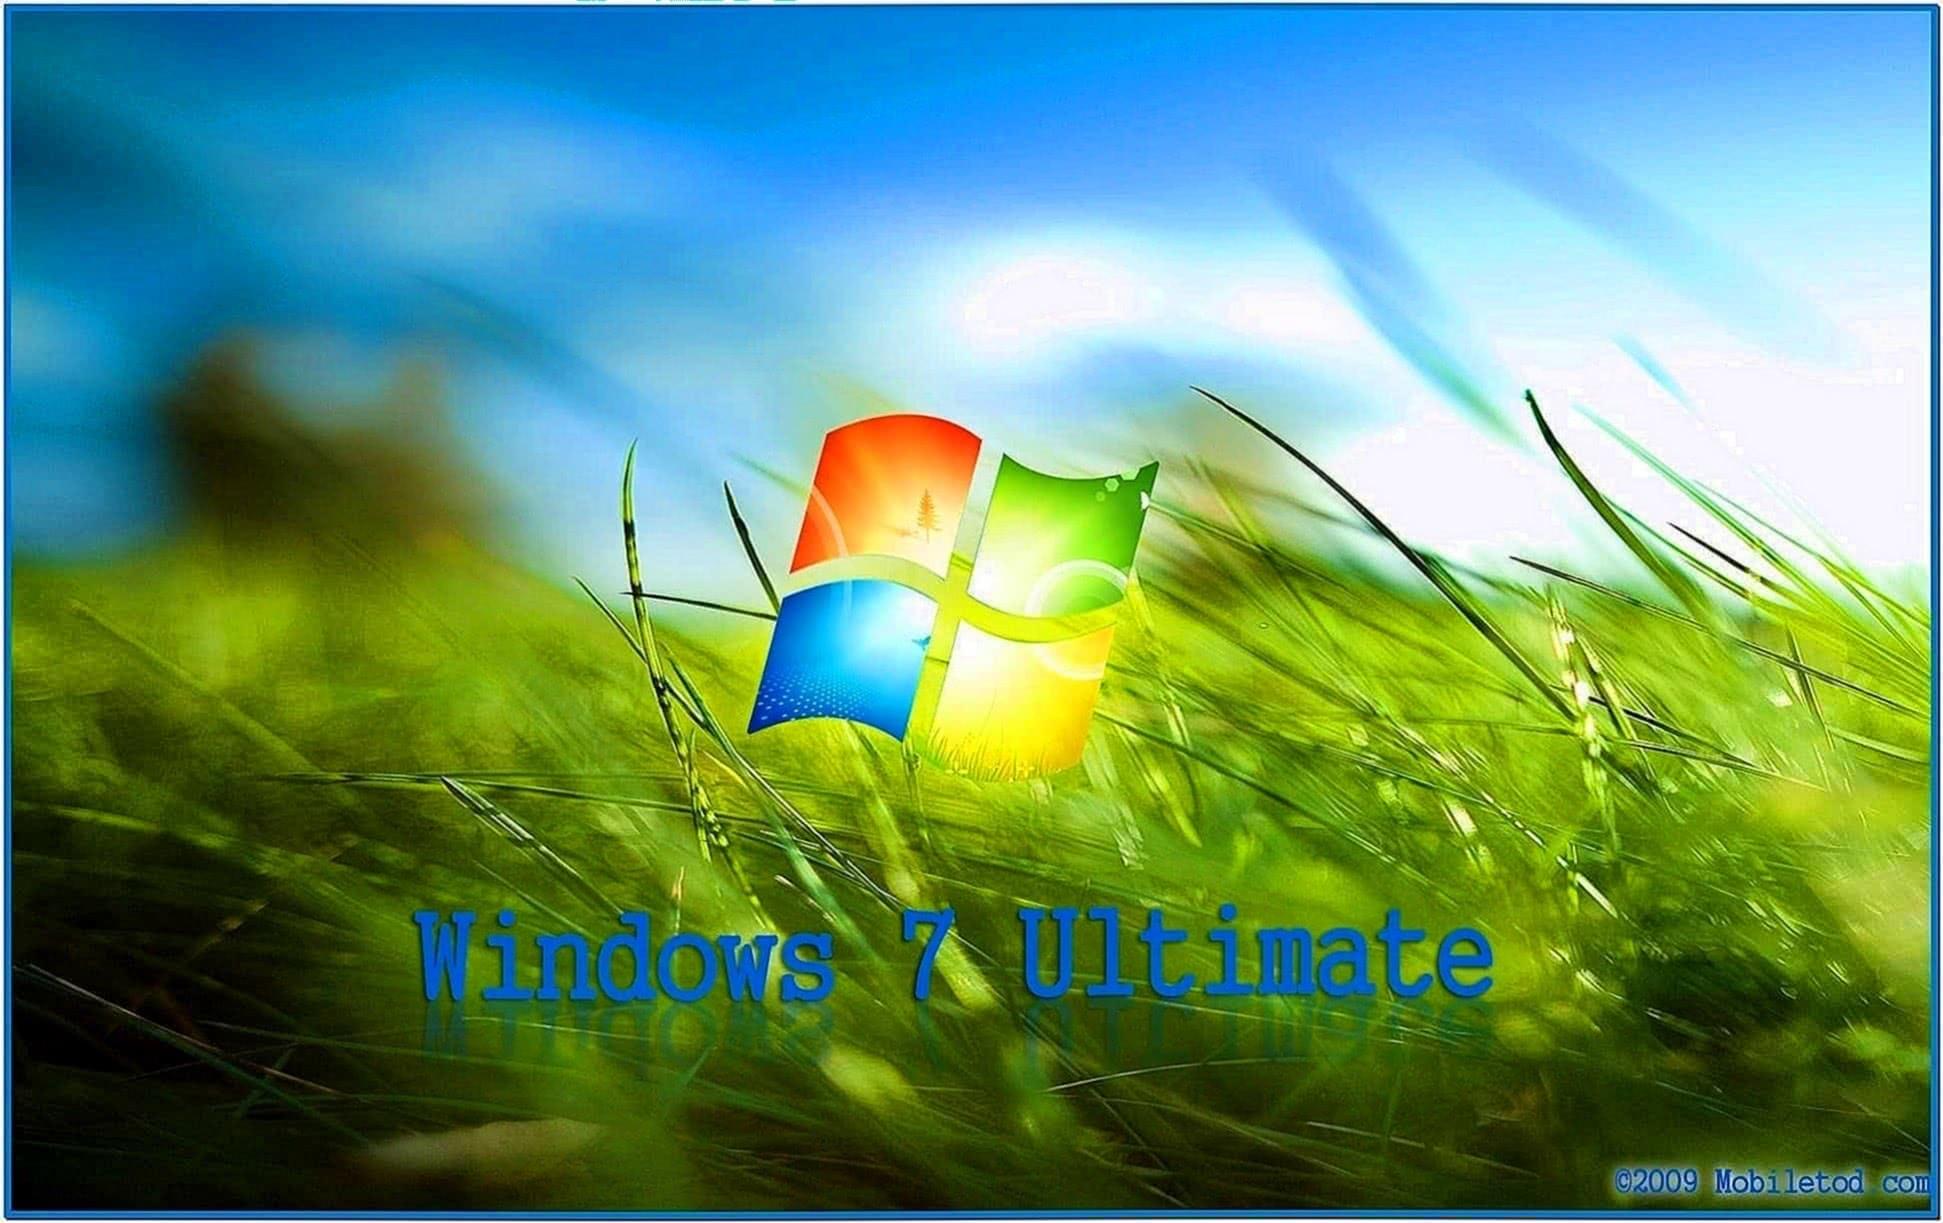 Animated screensavers windows 7 ultimate - Download free